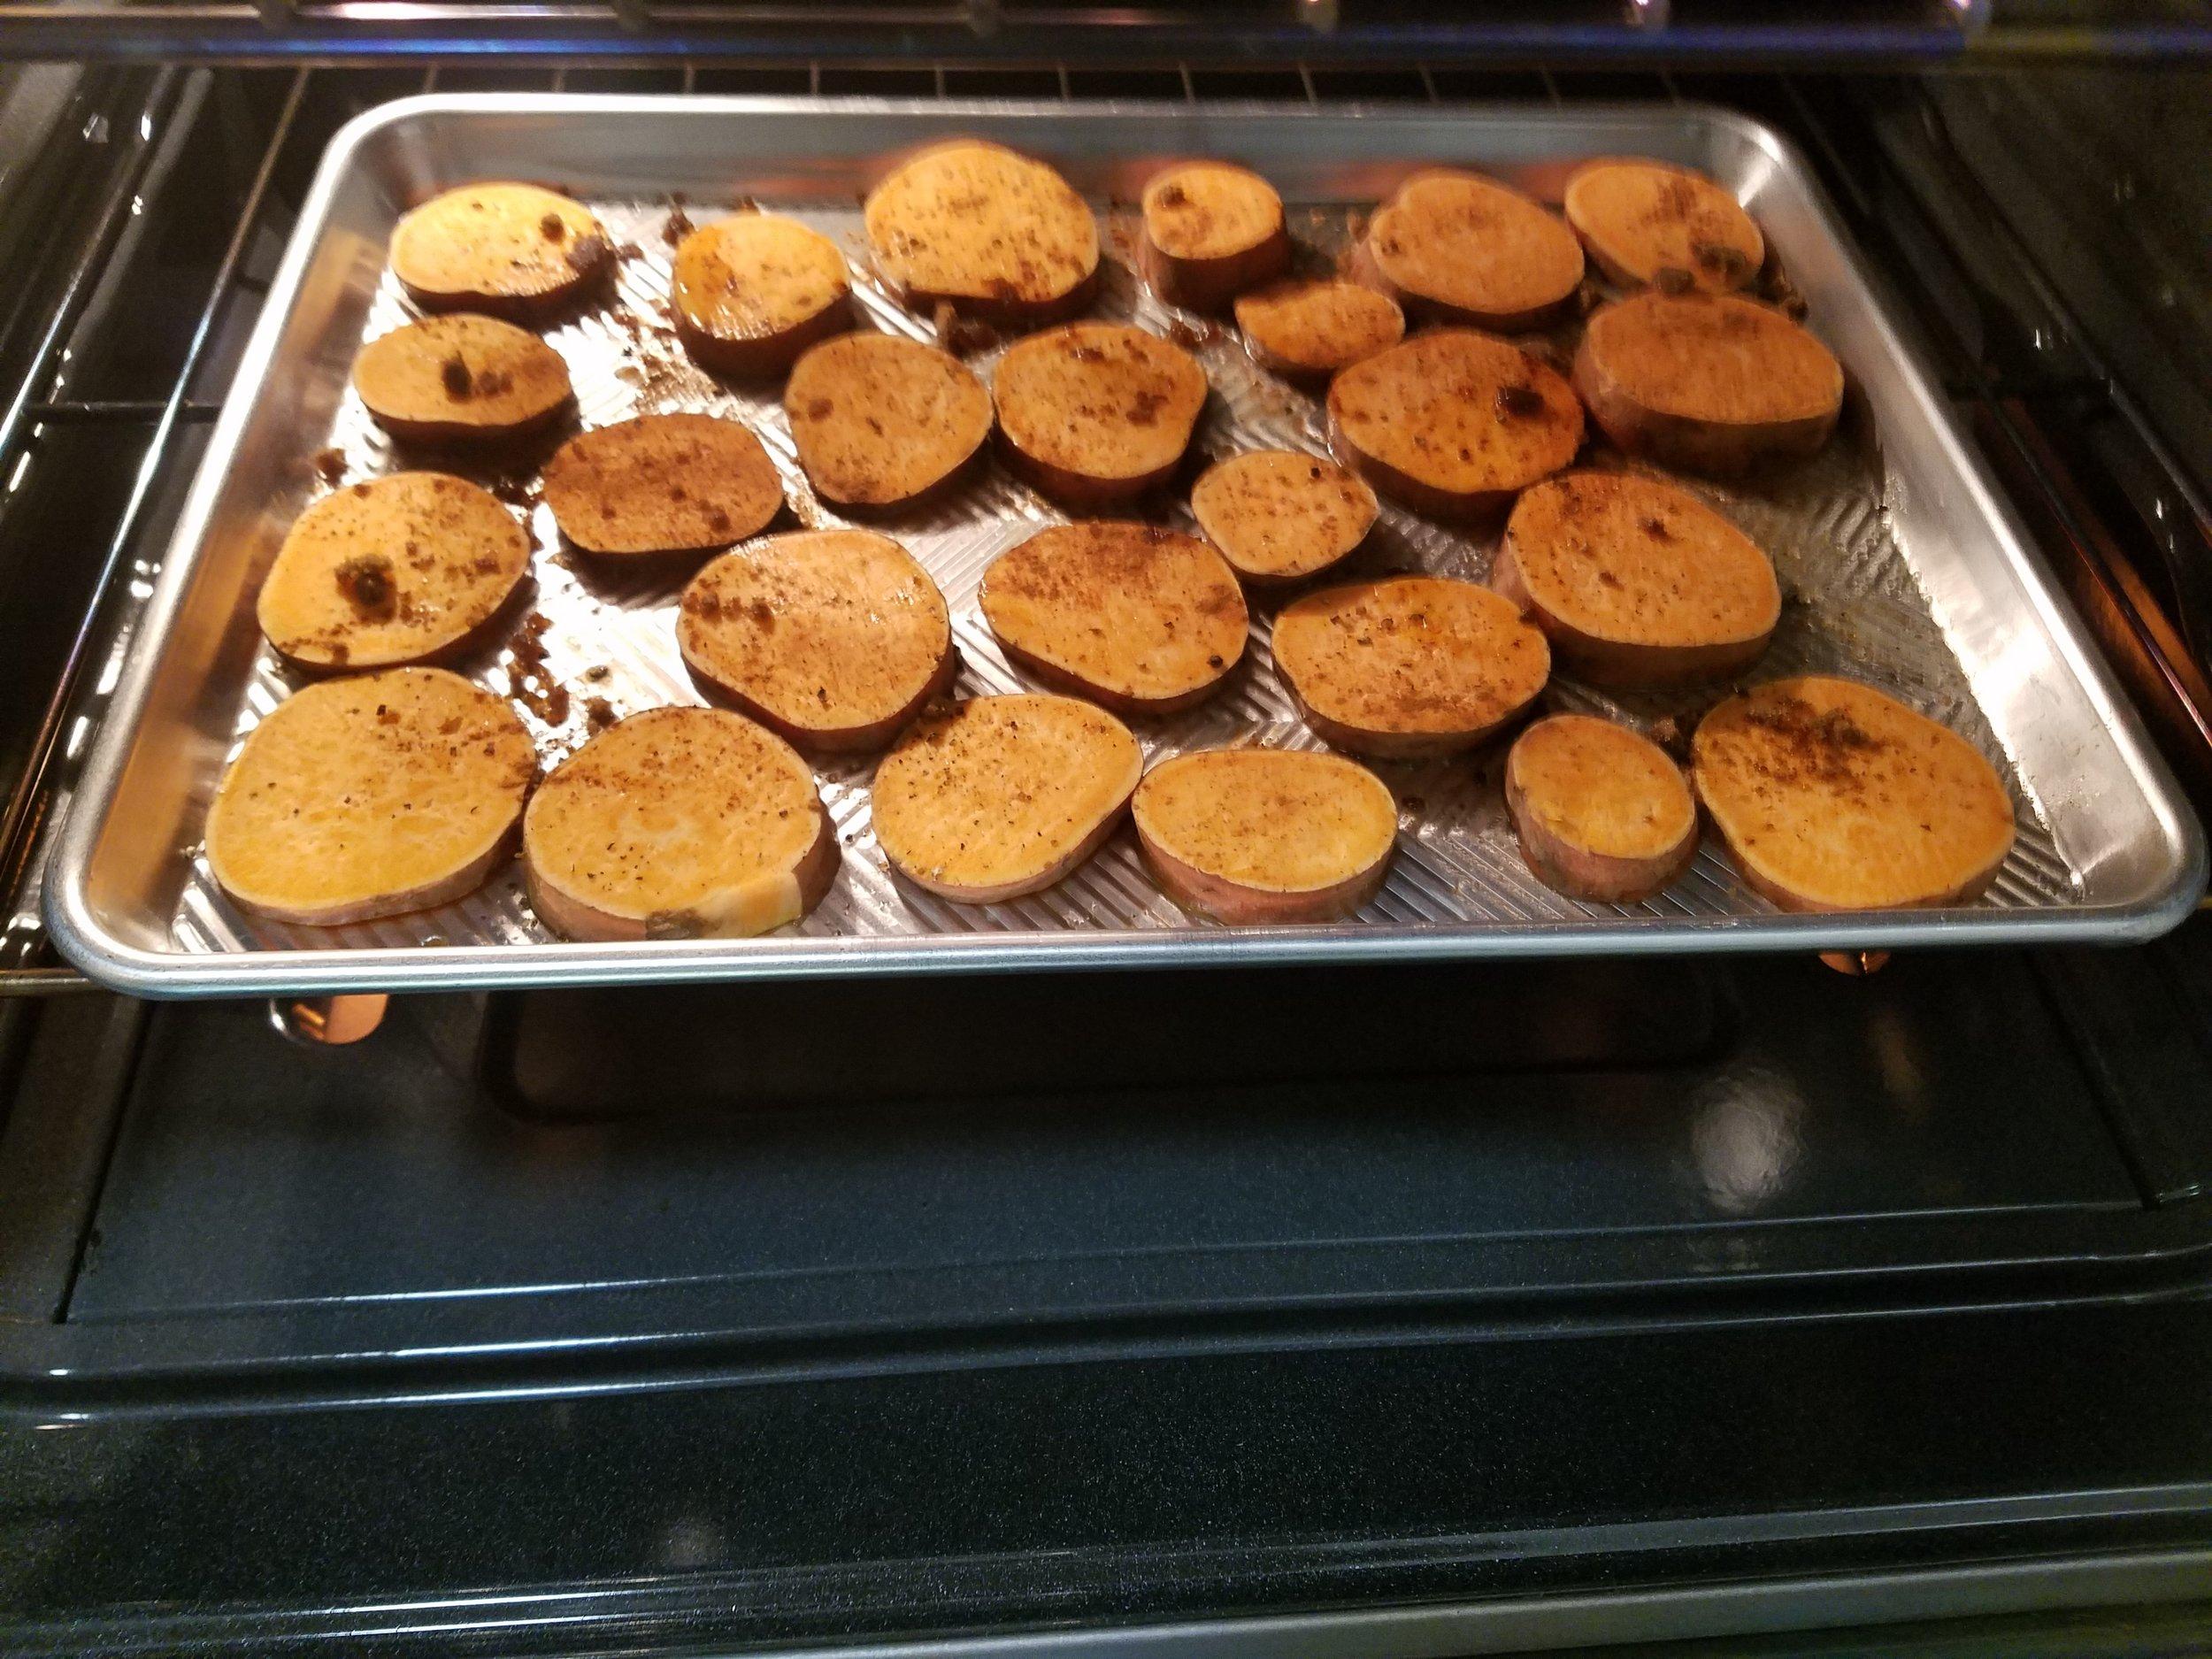 Chef_d Smoky Maple Pork Loin Season Sweet Potatoes w Brown Sugar and Nutmeg.jpg